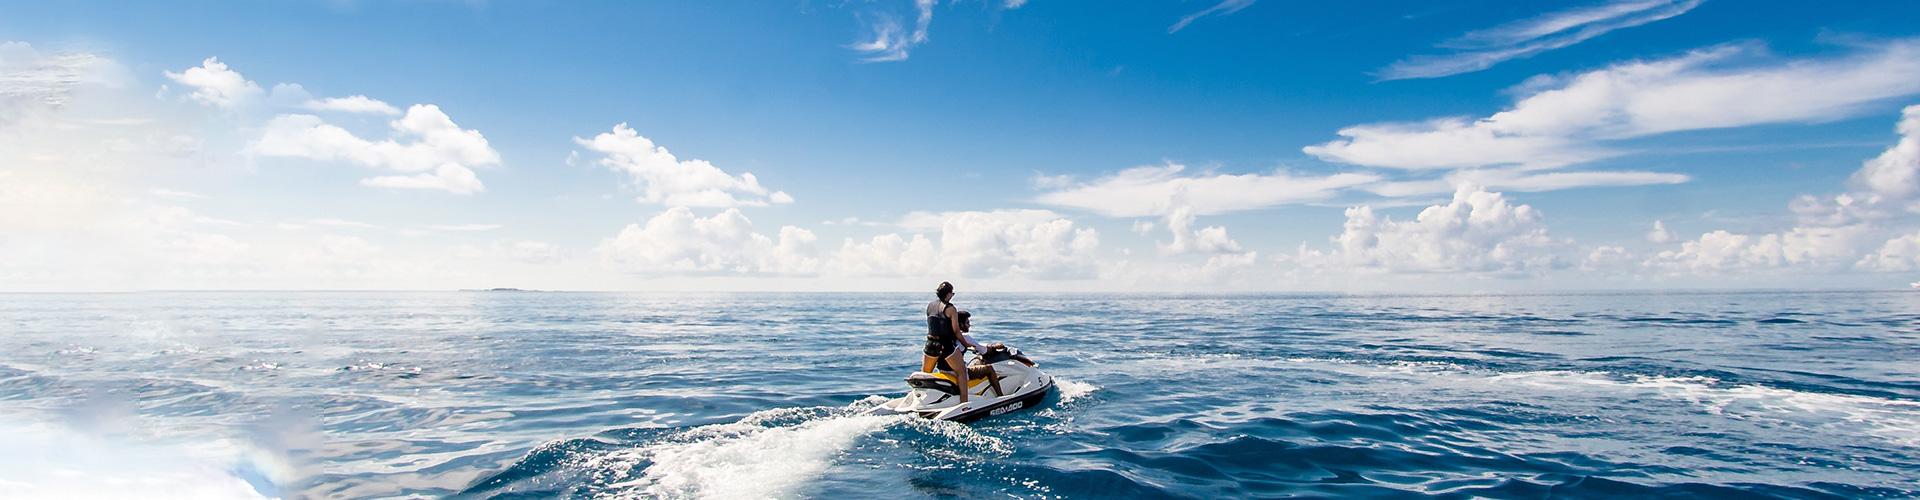 Watersportverzekering op reis